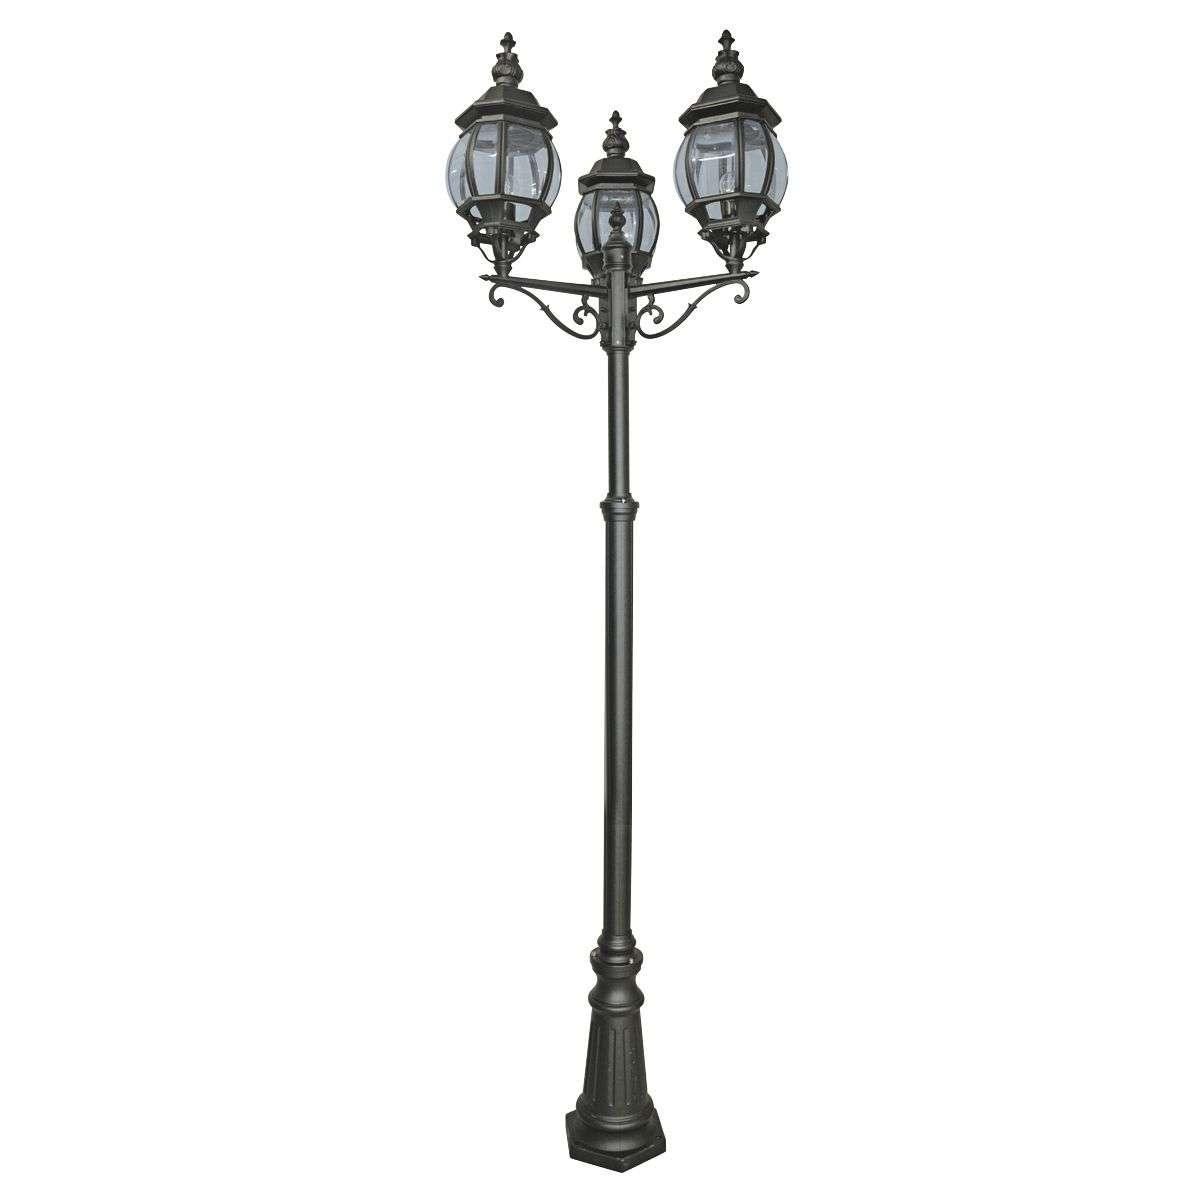 Bel Aire 2200 mm 3 Light Outdoor Post Lamp Black